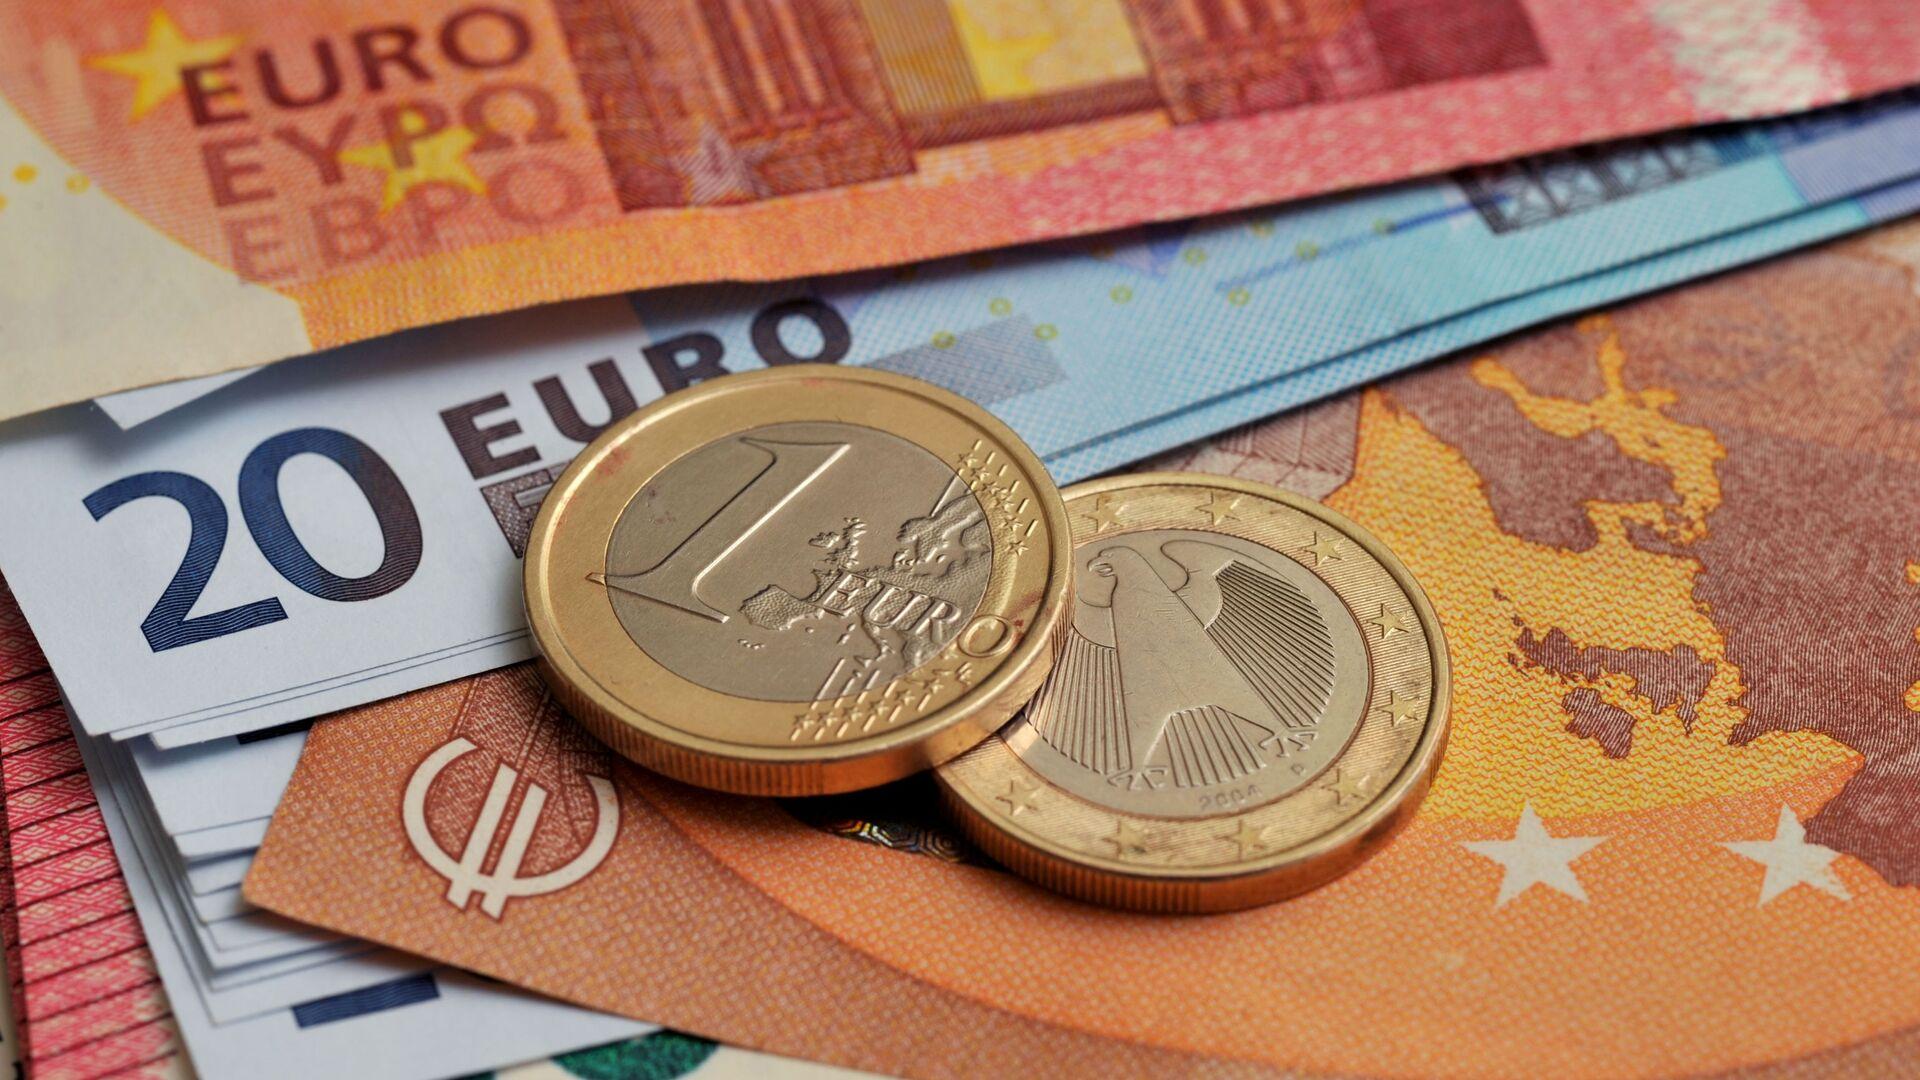 Монеты номиналом 1 евро на фоне банкнот номиналом 10 и 20 евро - Sputnik Latvija, 1920, 08.04.2021